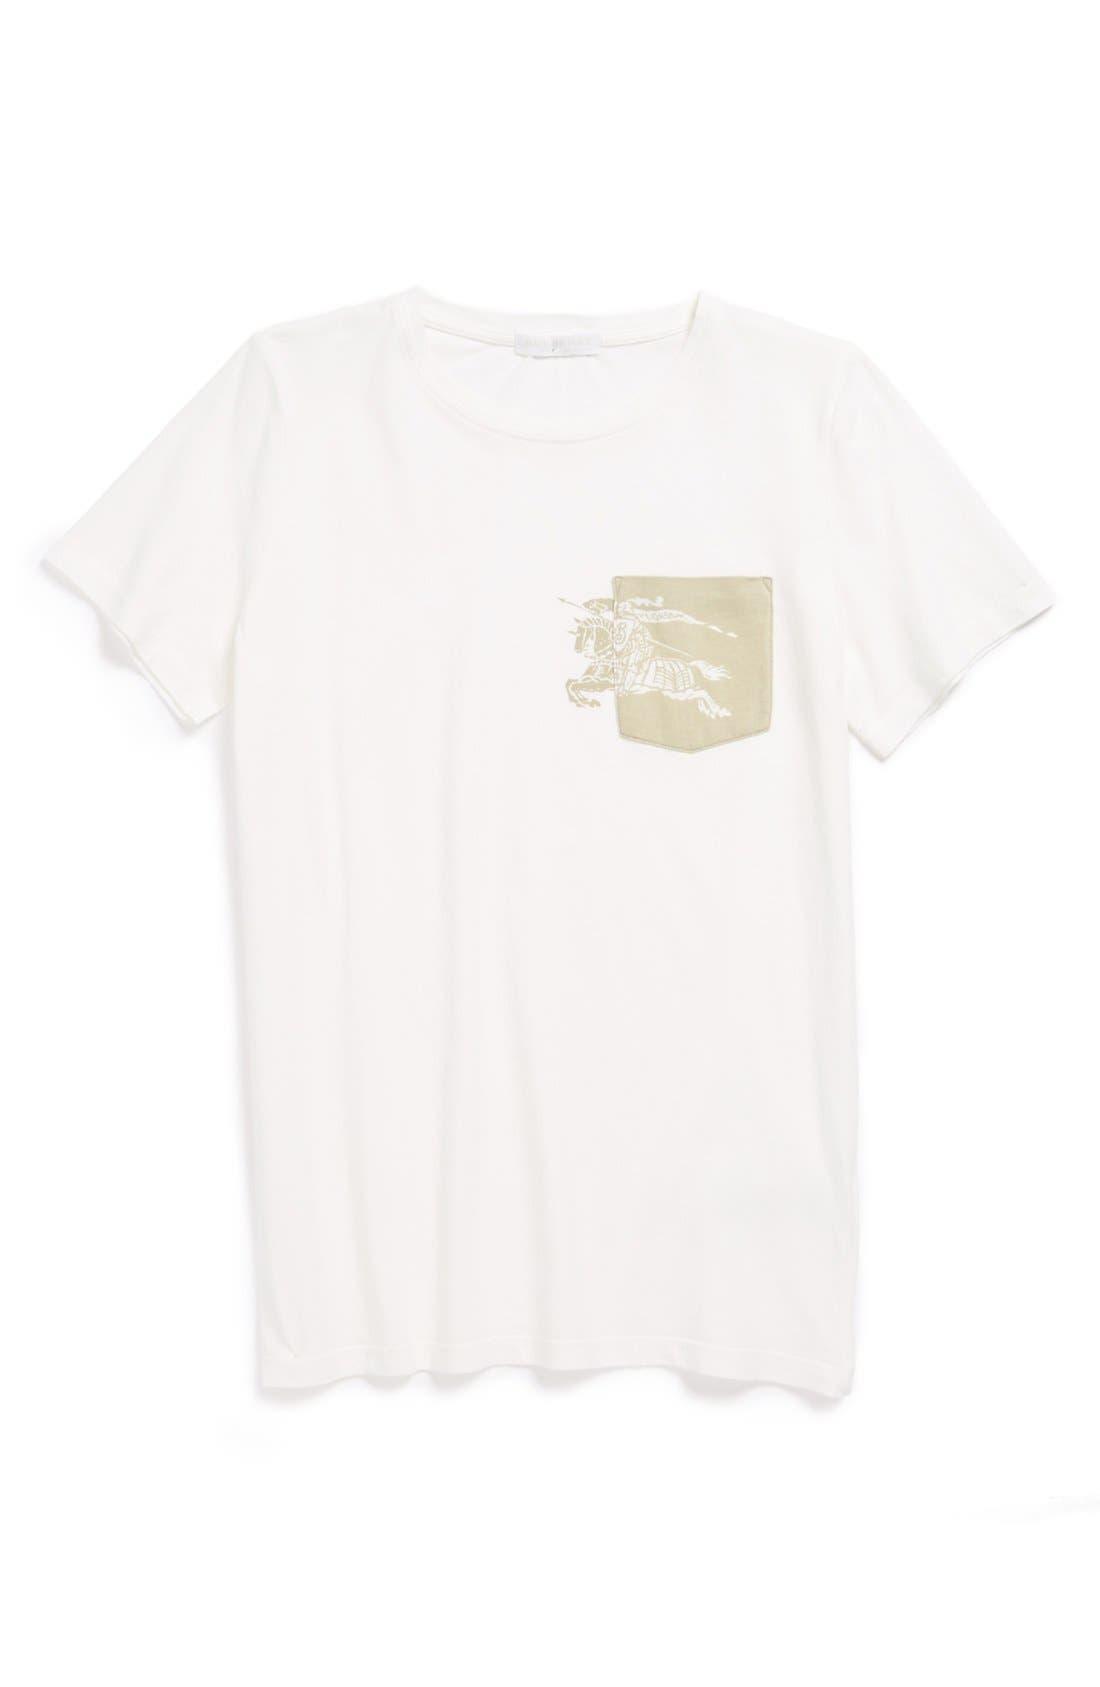 Main Image - Burberry 'Hackett' T-Shirt (Toddler Boys, Little Boys & Big Boys)